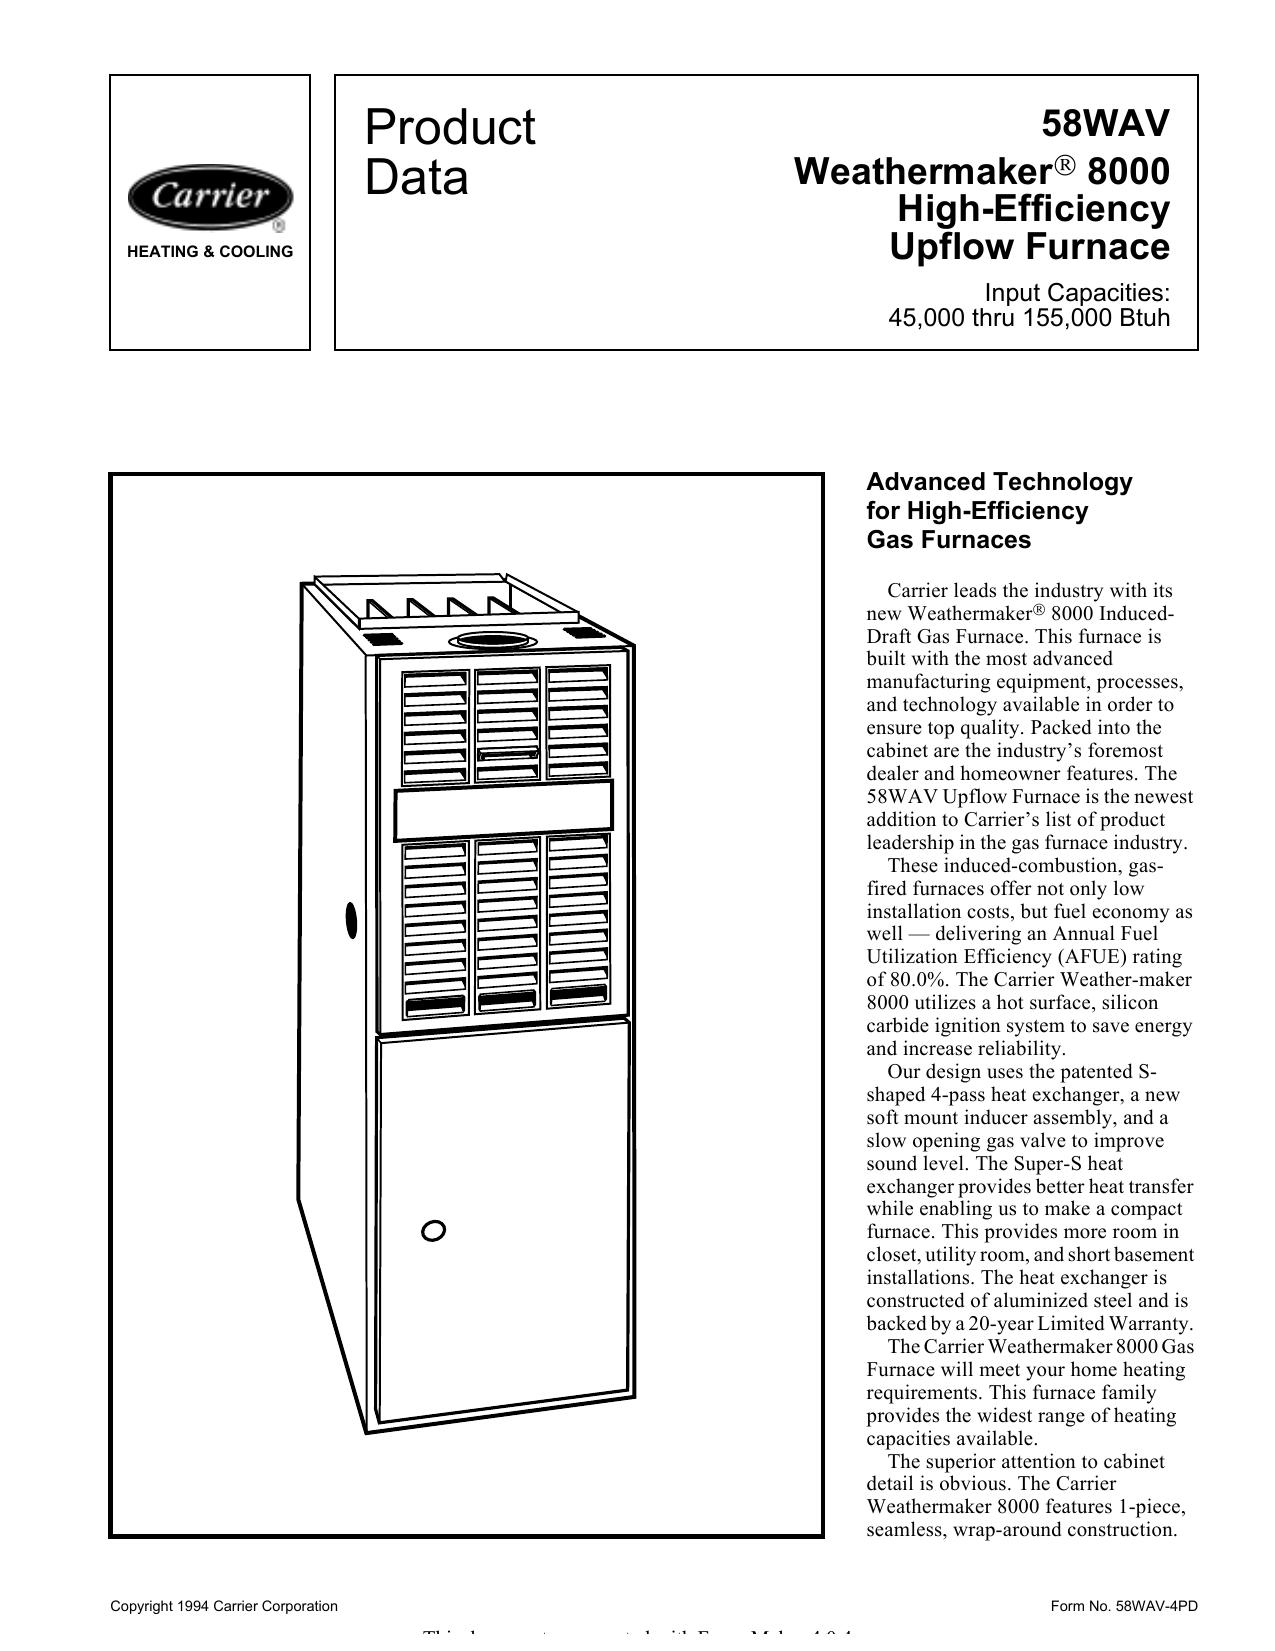 Product Data - HVACpartners | manualzz com